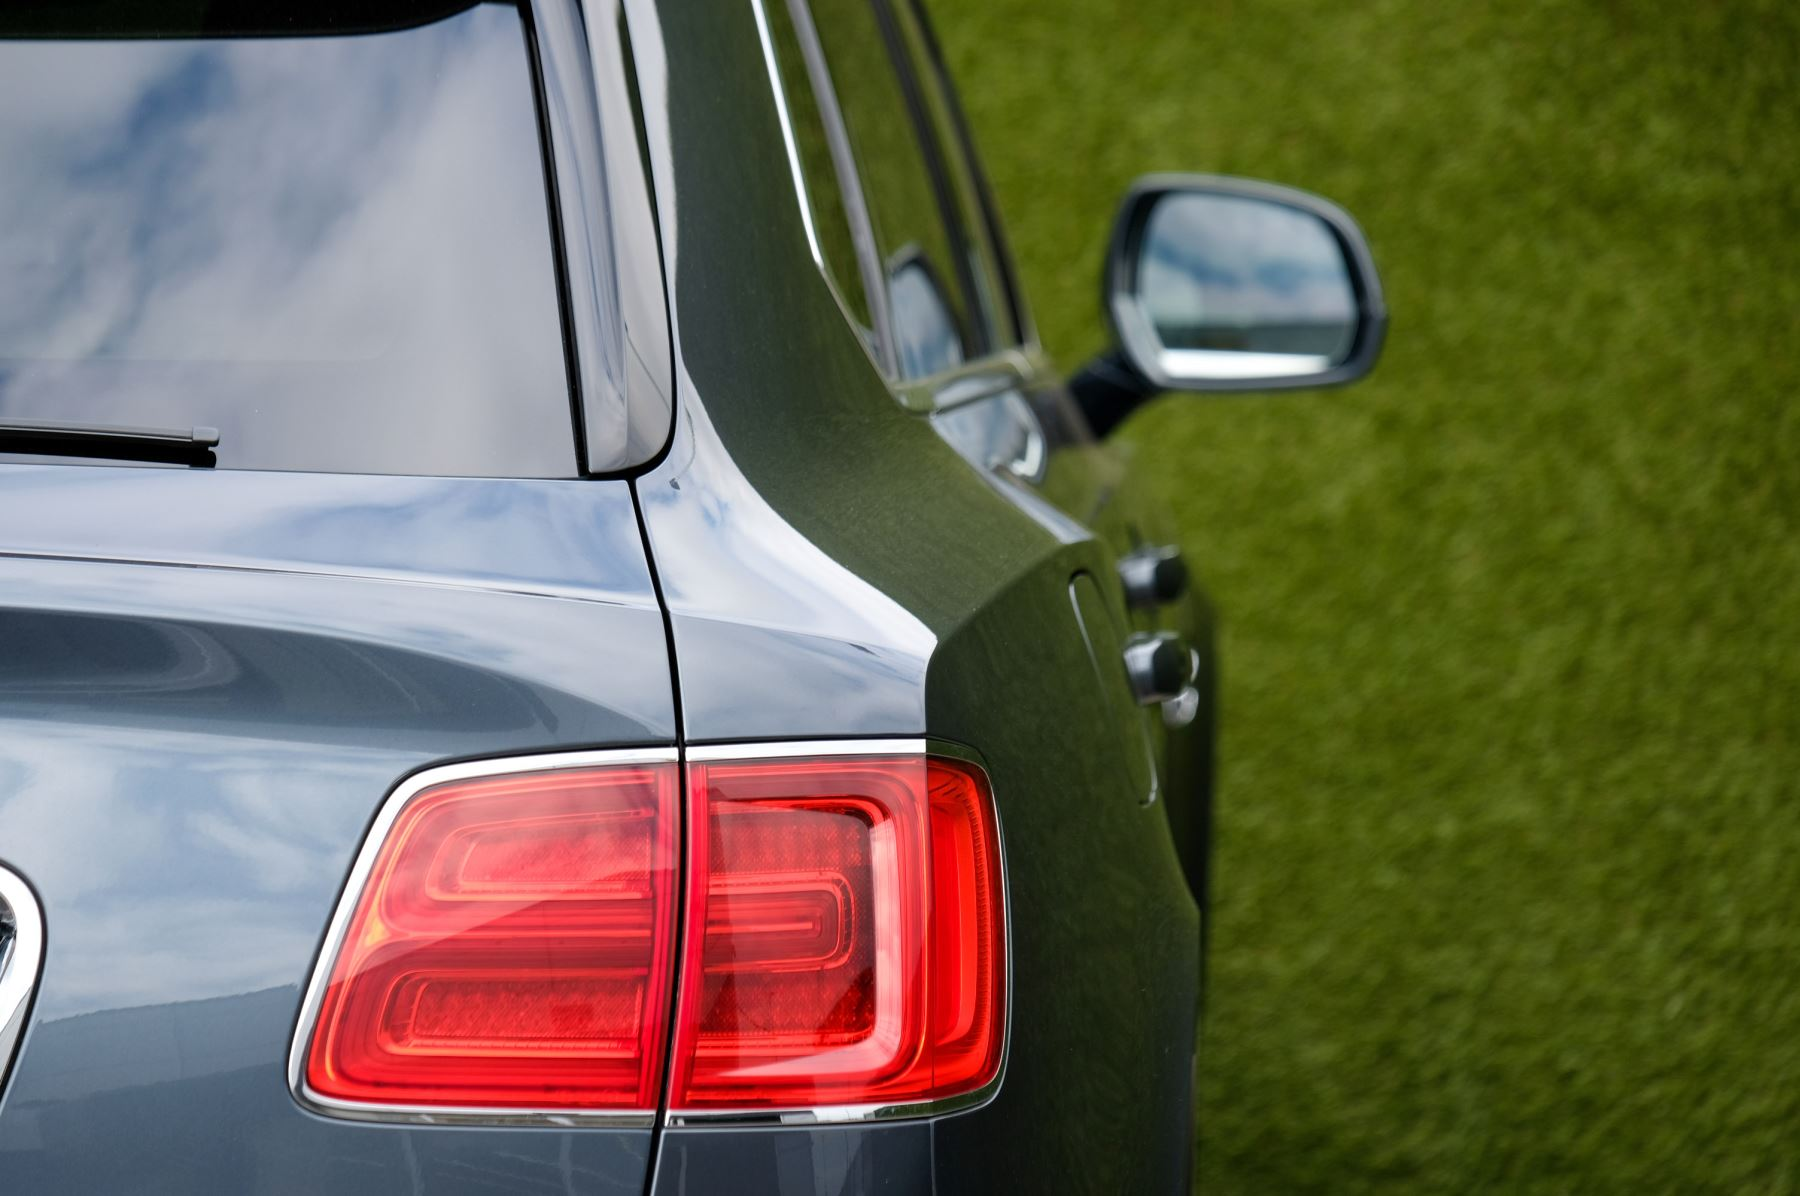 Bentley Bentayga 4.0 V8 5dr - Mulliner Driving Specification - City & Tour Specification image 8